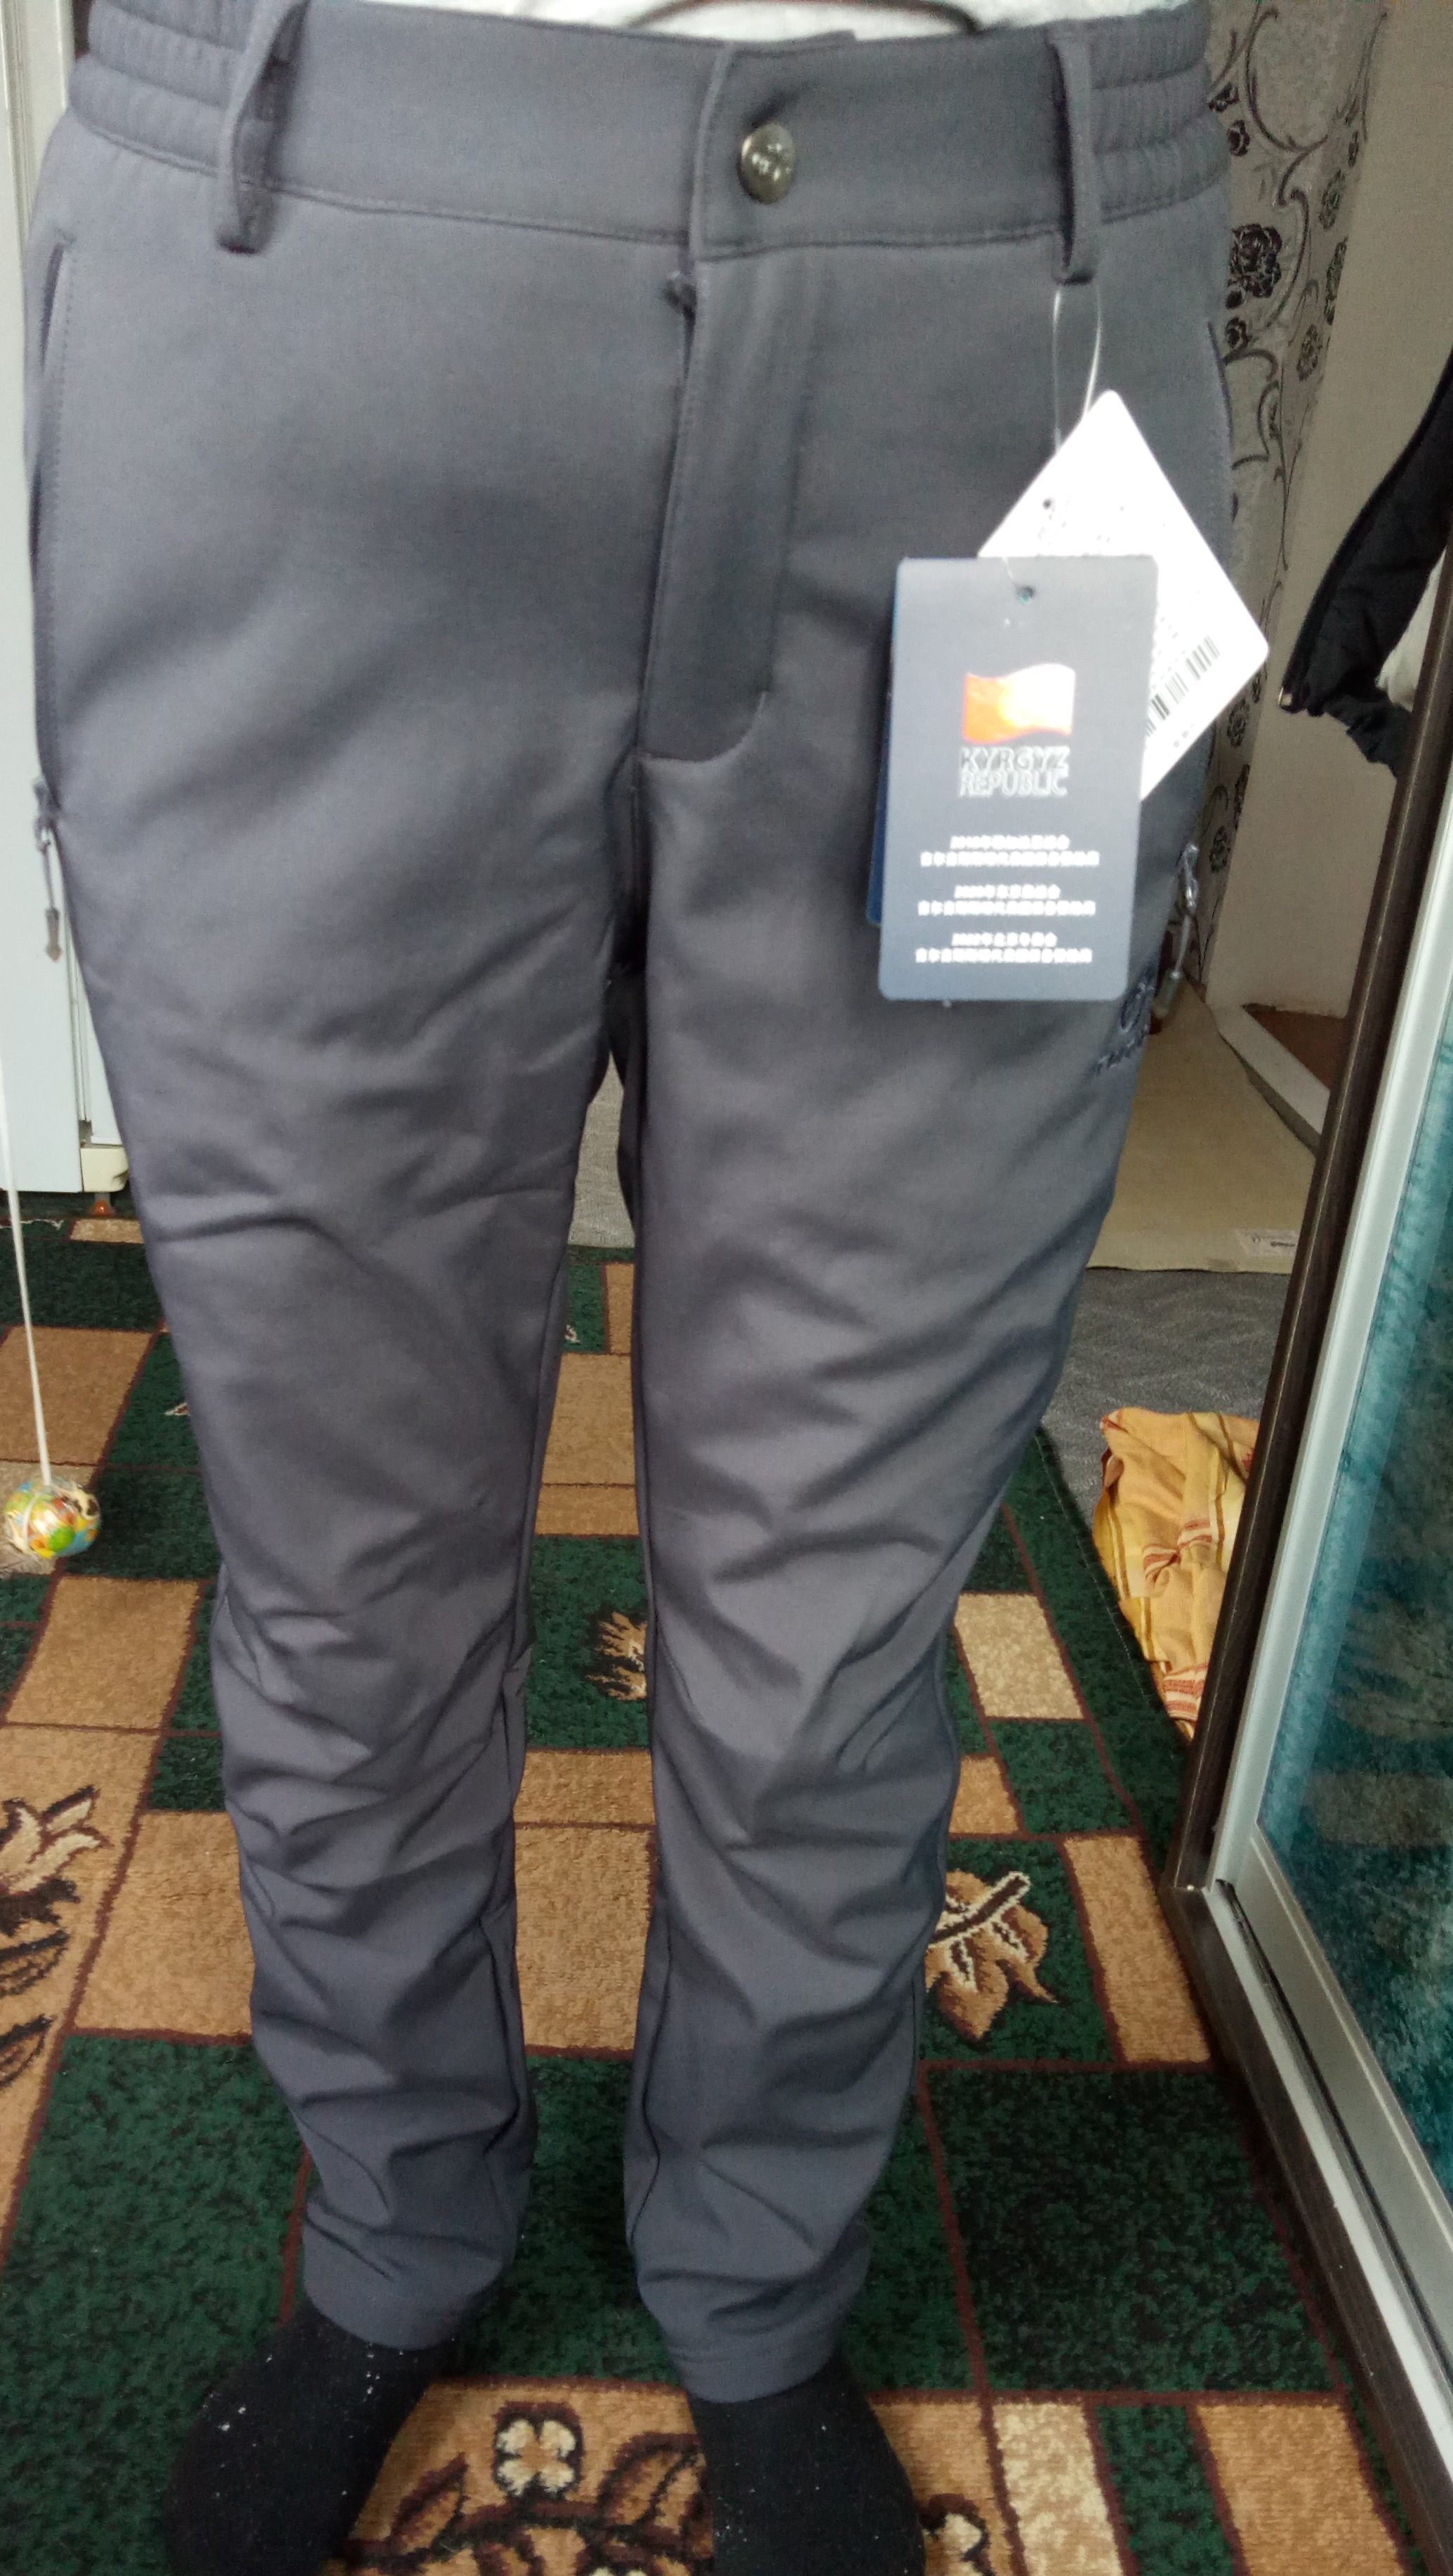 Tectop Pantalones Termicos De Exterior Para Hombre Y Mujer Pantalones Gruesos Impermeables A Prueba De Viento Para Senderismo Otono E Invierno Hiking Pants Outdoor Hiking Pantssoft Shell Pants Aliexpress